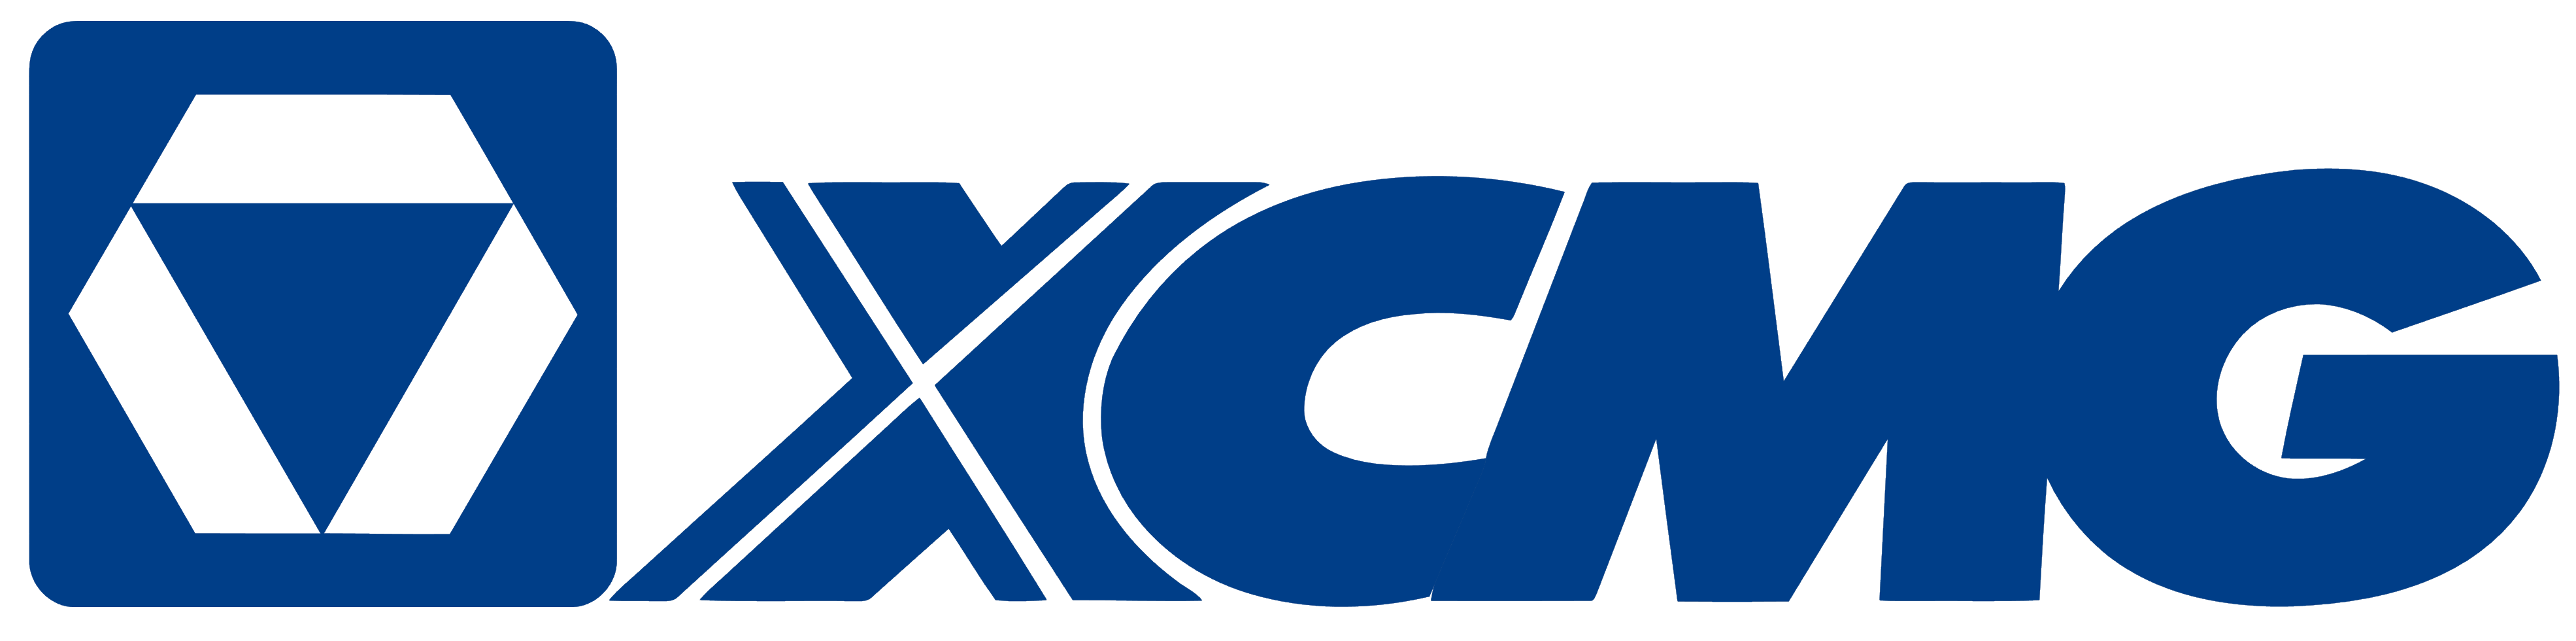 XCMG VIETNAM